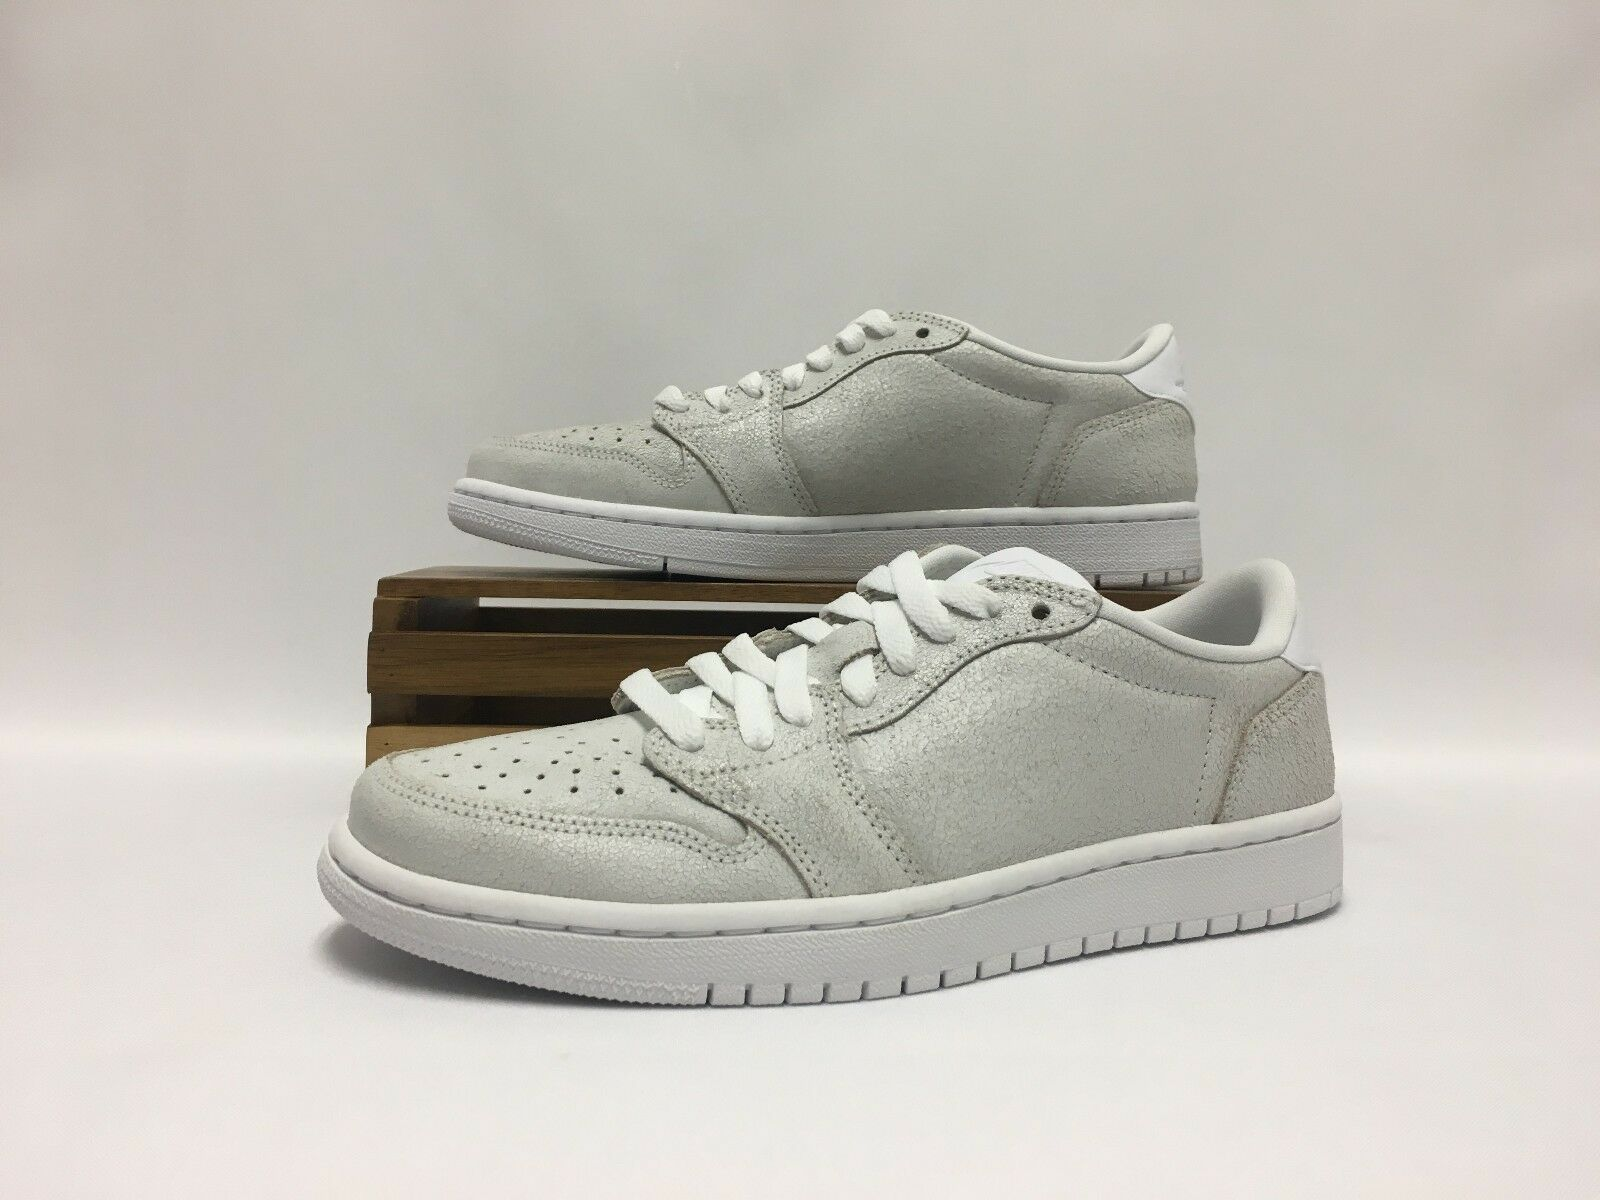 Nike Air Jordan 1 Retro Low NS White Gray AH7232-100 No Swoosh Women's NEW DS